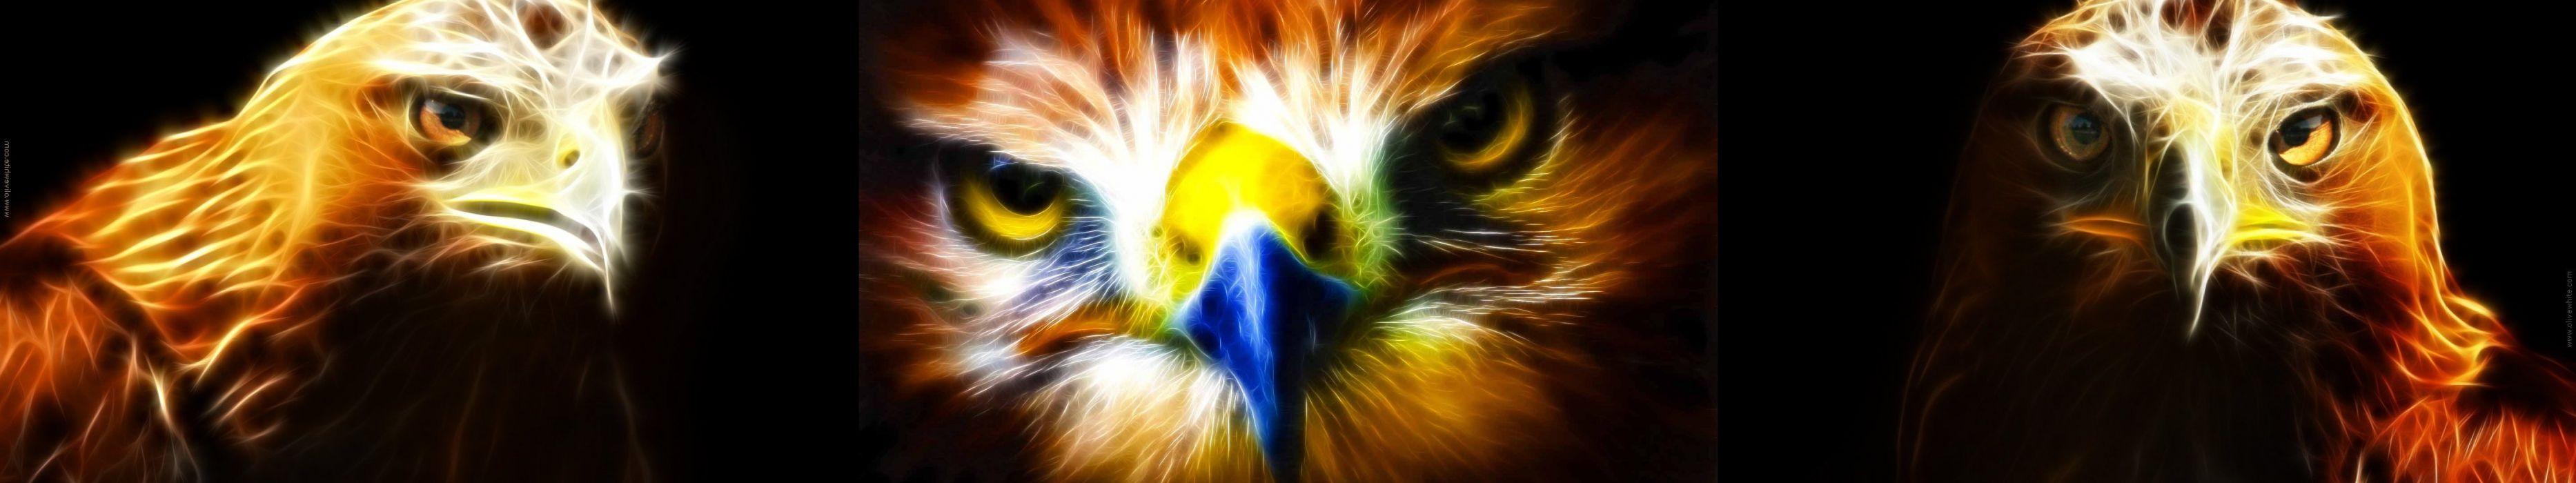 wallpaper triple multi multiple screen monitor animal light eagle wallpaper